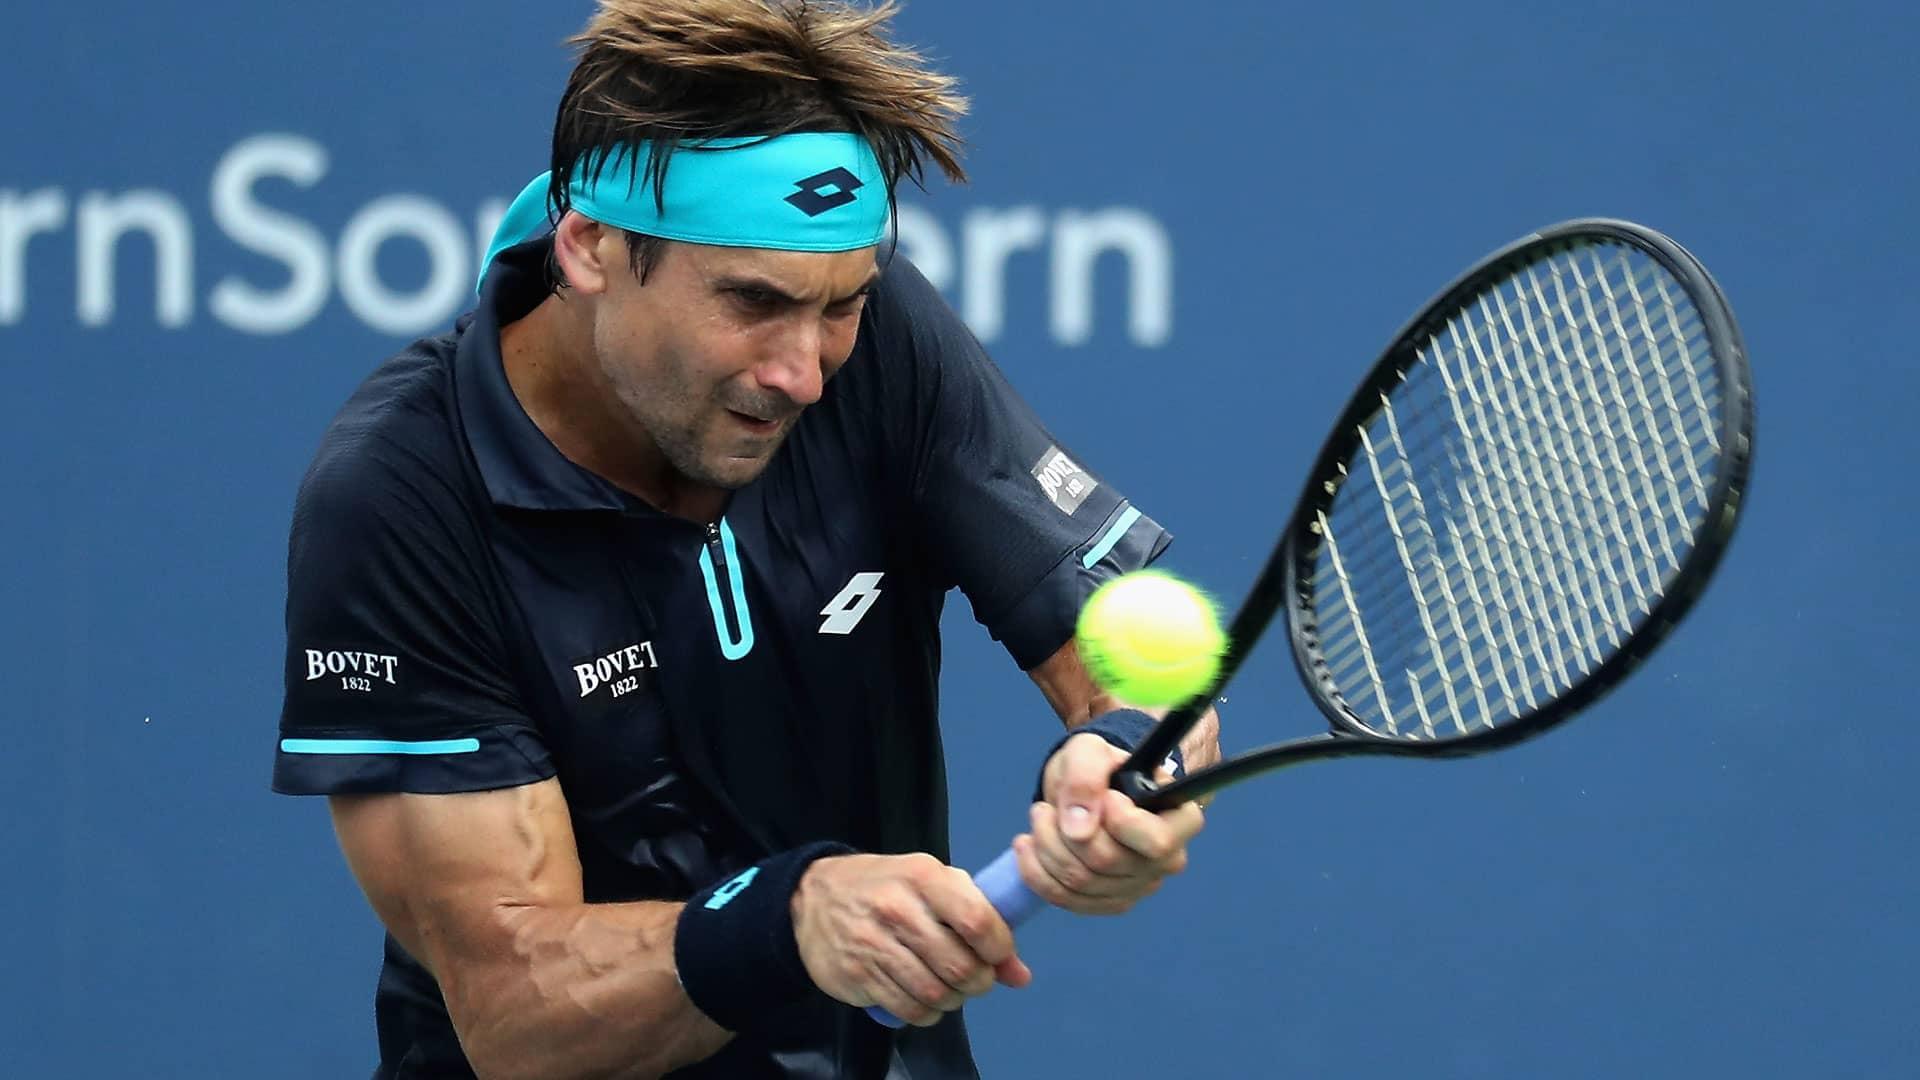 david ferrer | overview | atp world tour | tennis